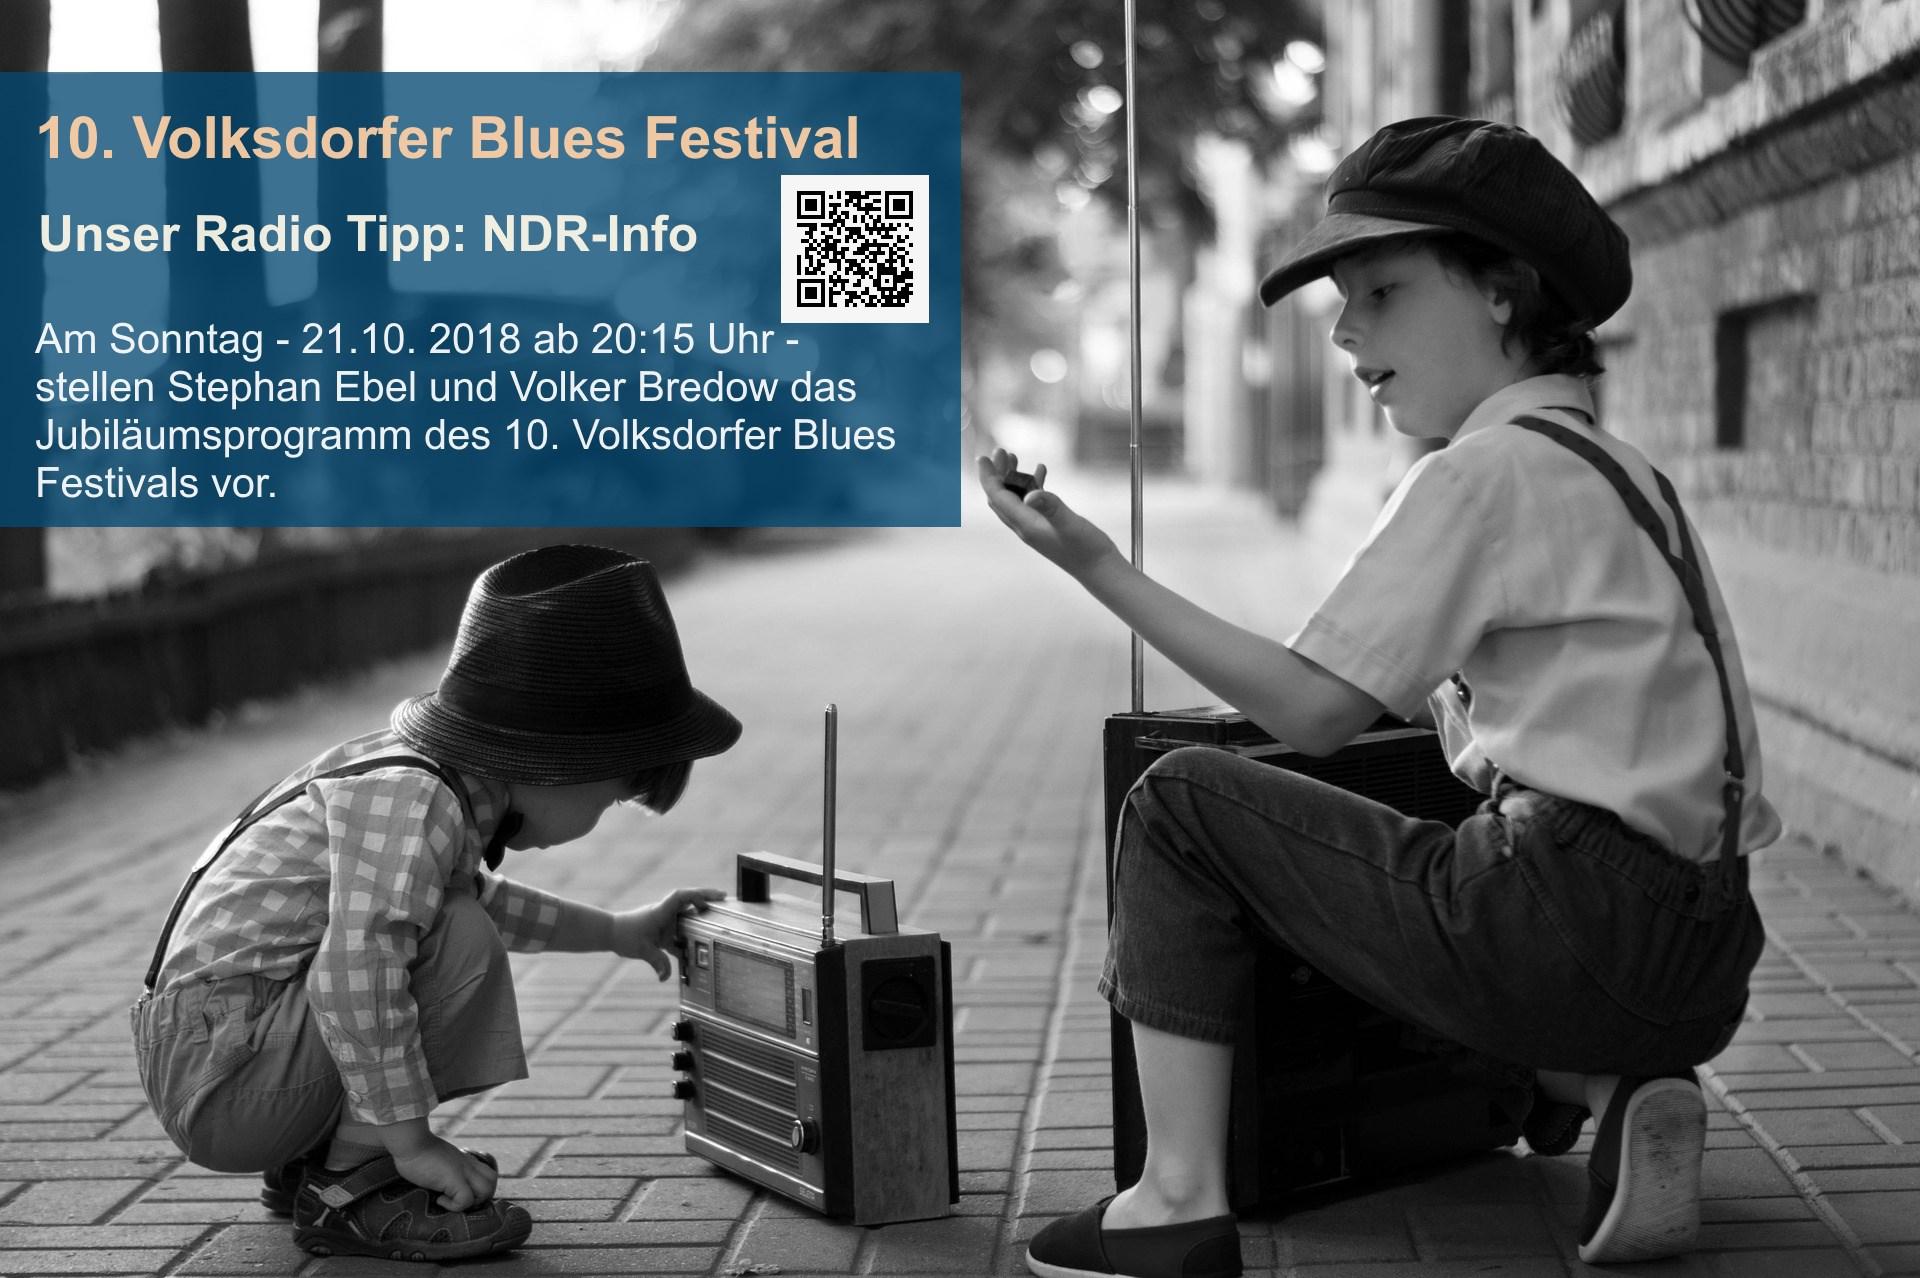 10.Volksdorfer Blues Festival: RADIO Tipp: NDR-Info!